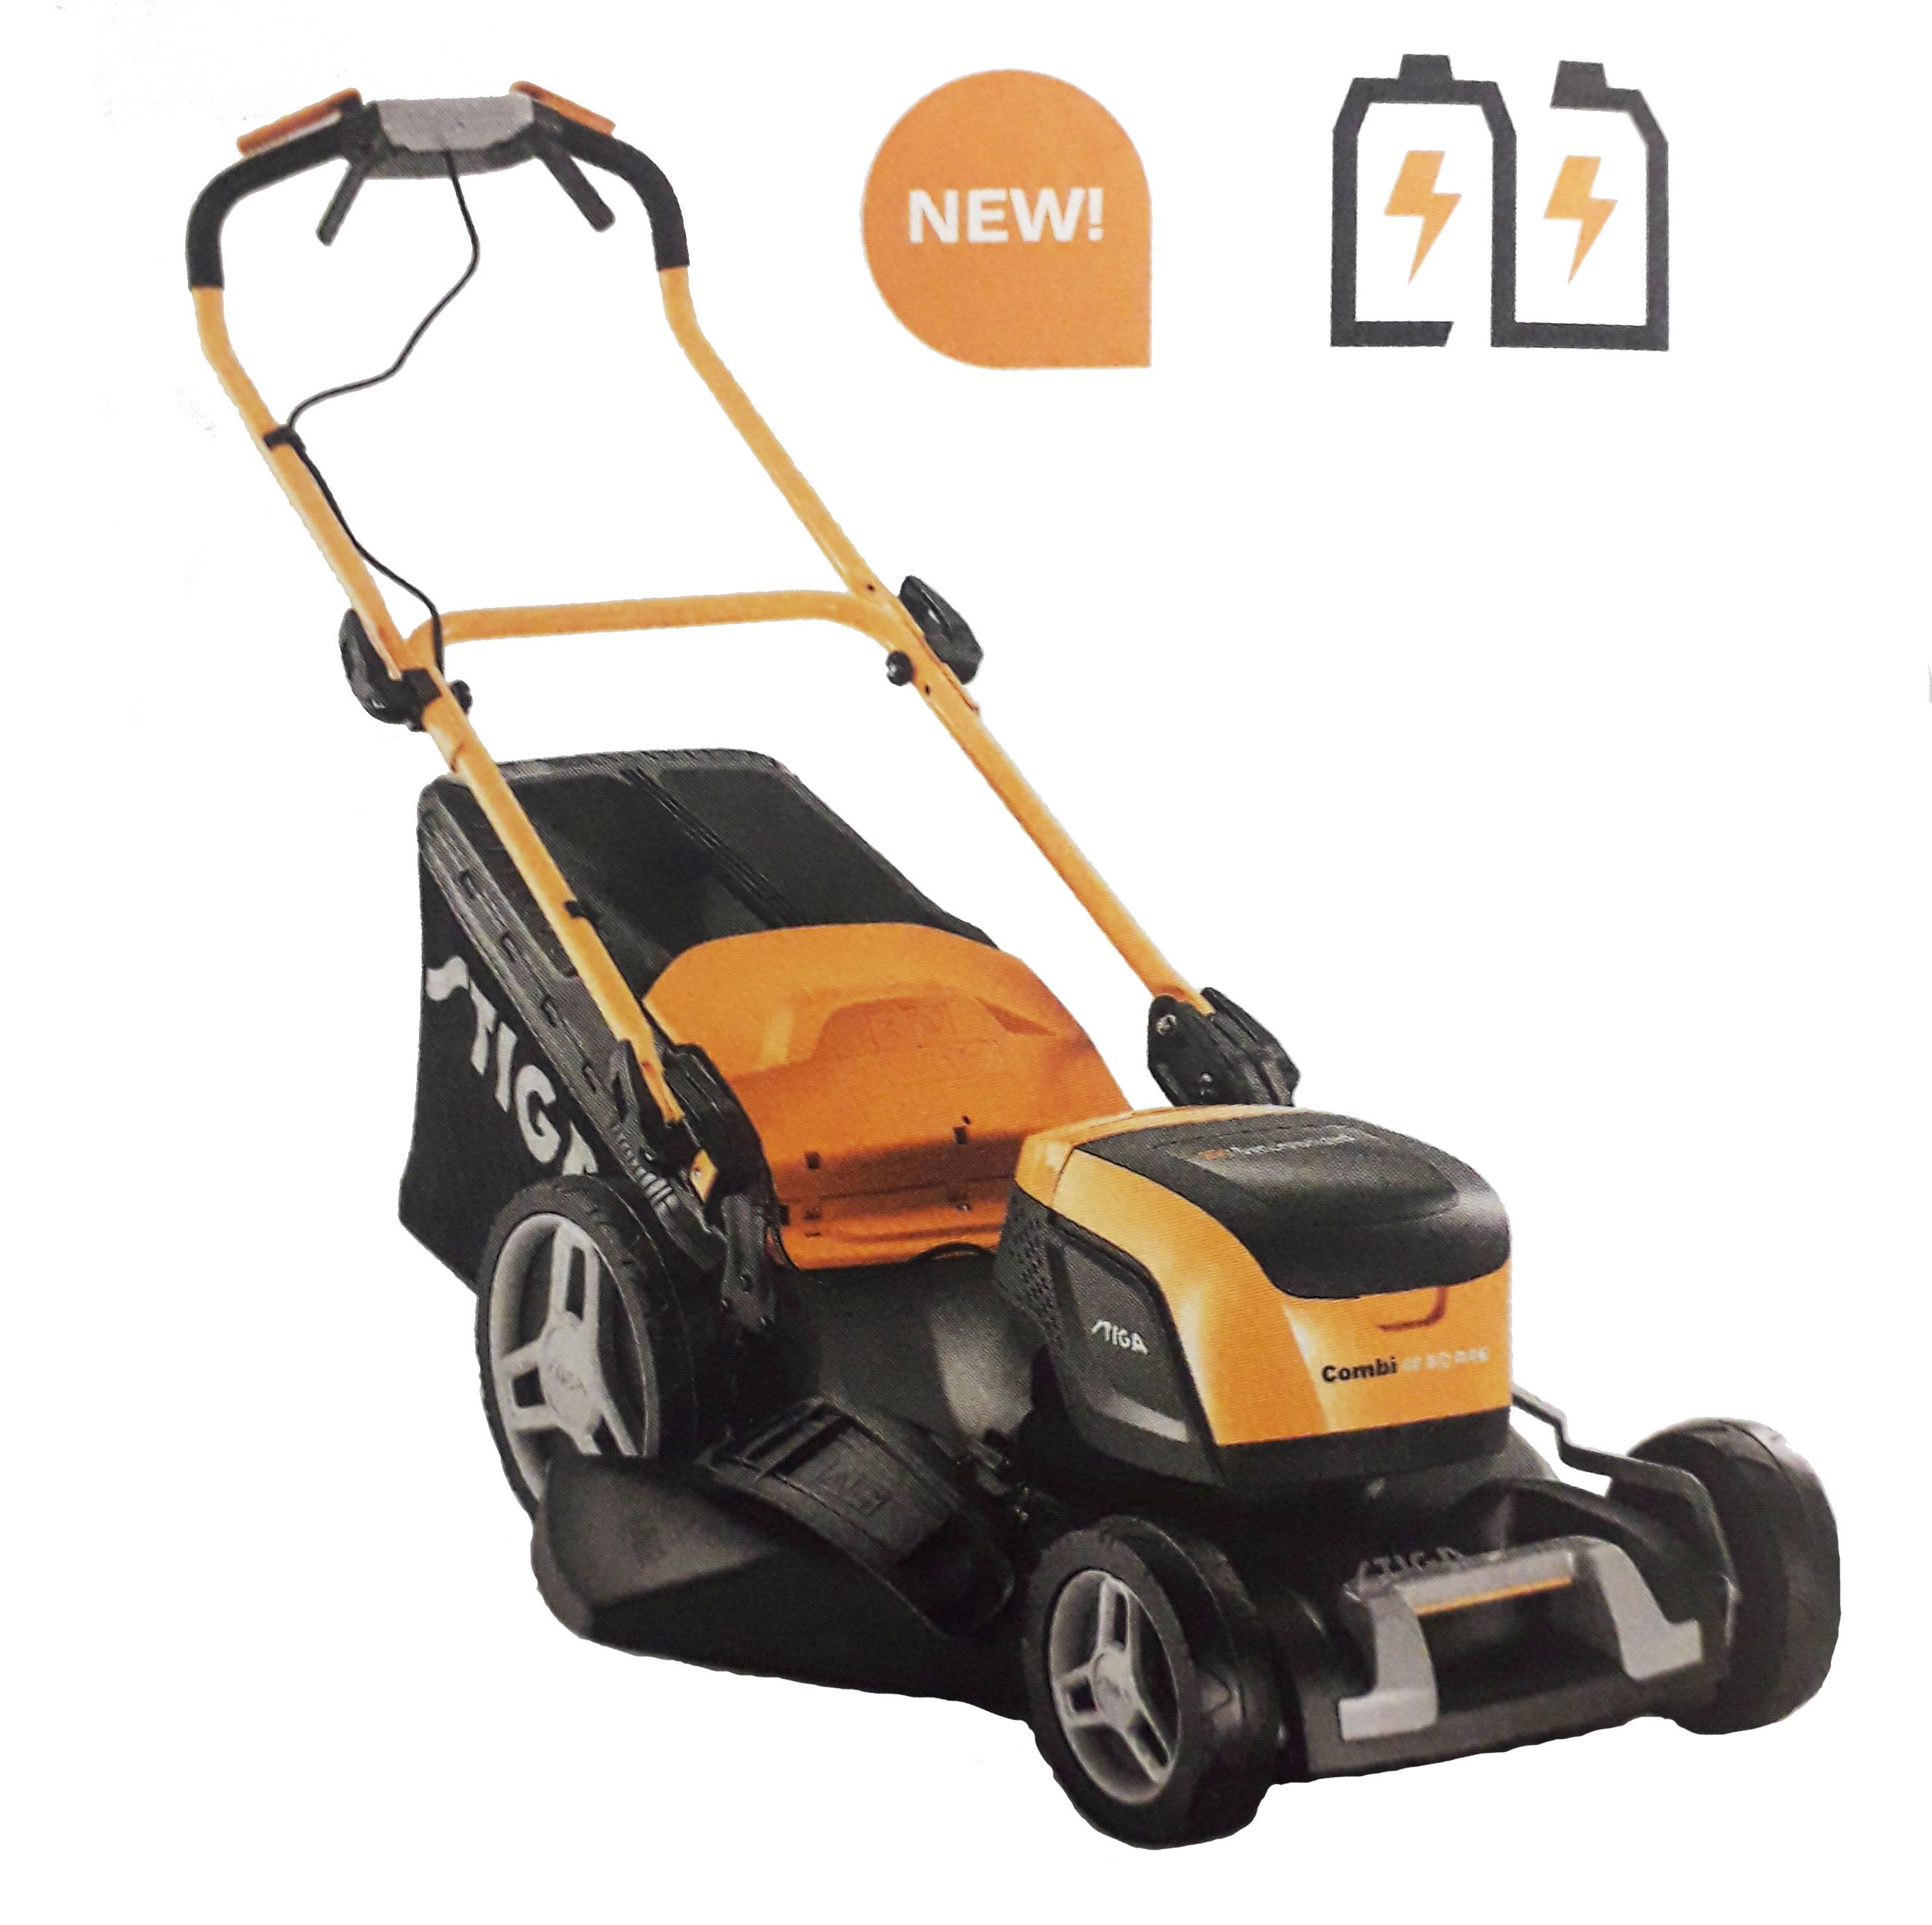 Stiga Combi 43 SQ DAE Cordless lawnmower